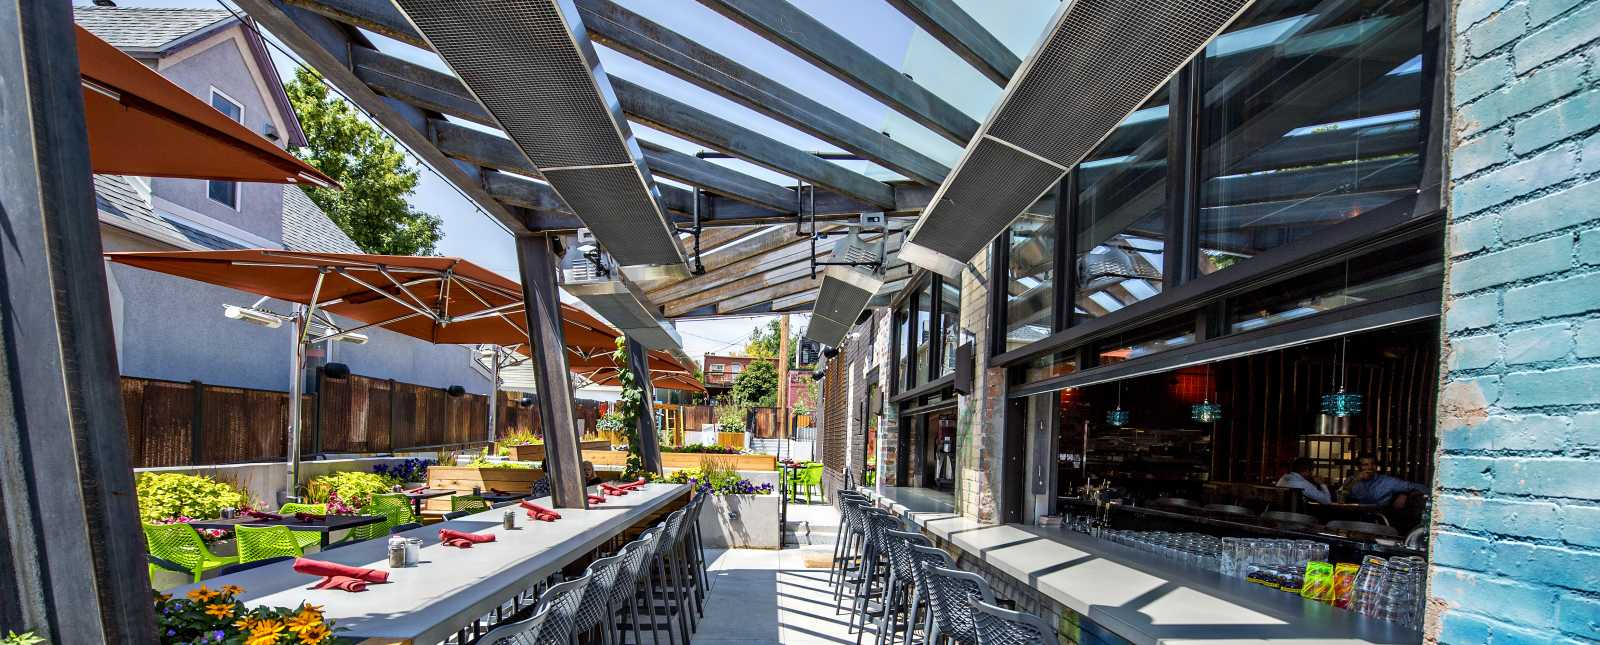 Acova restaurant in Denver